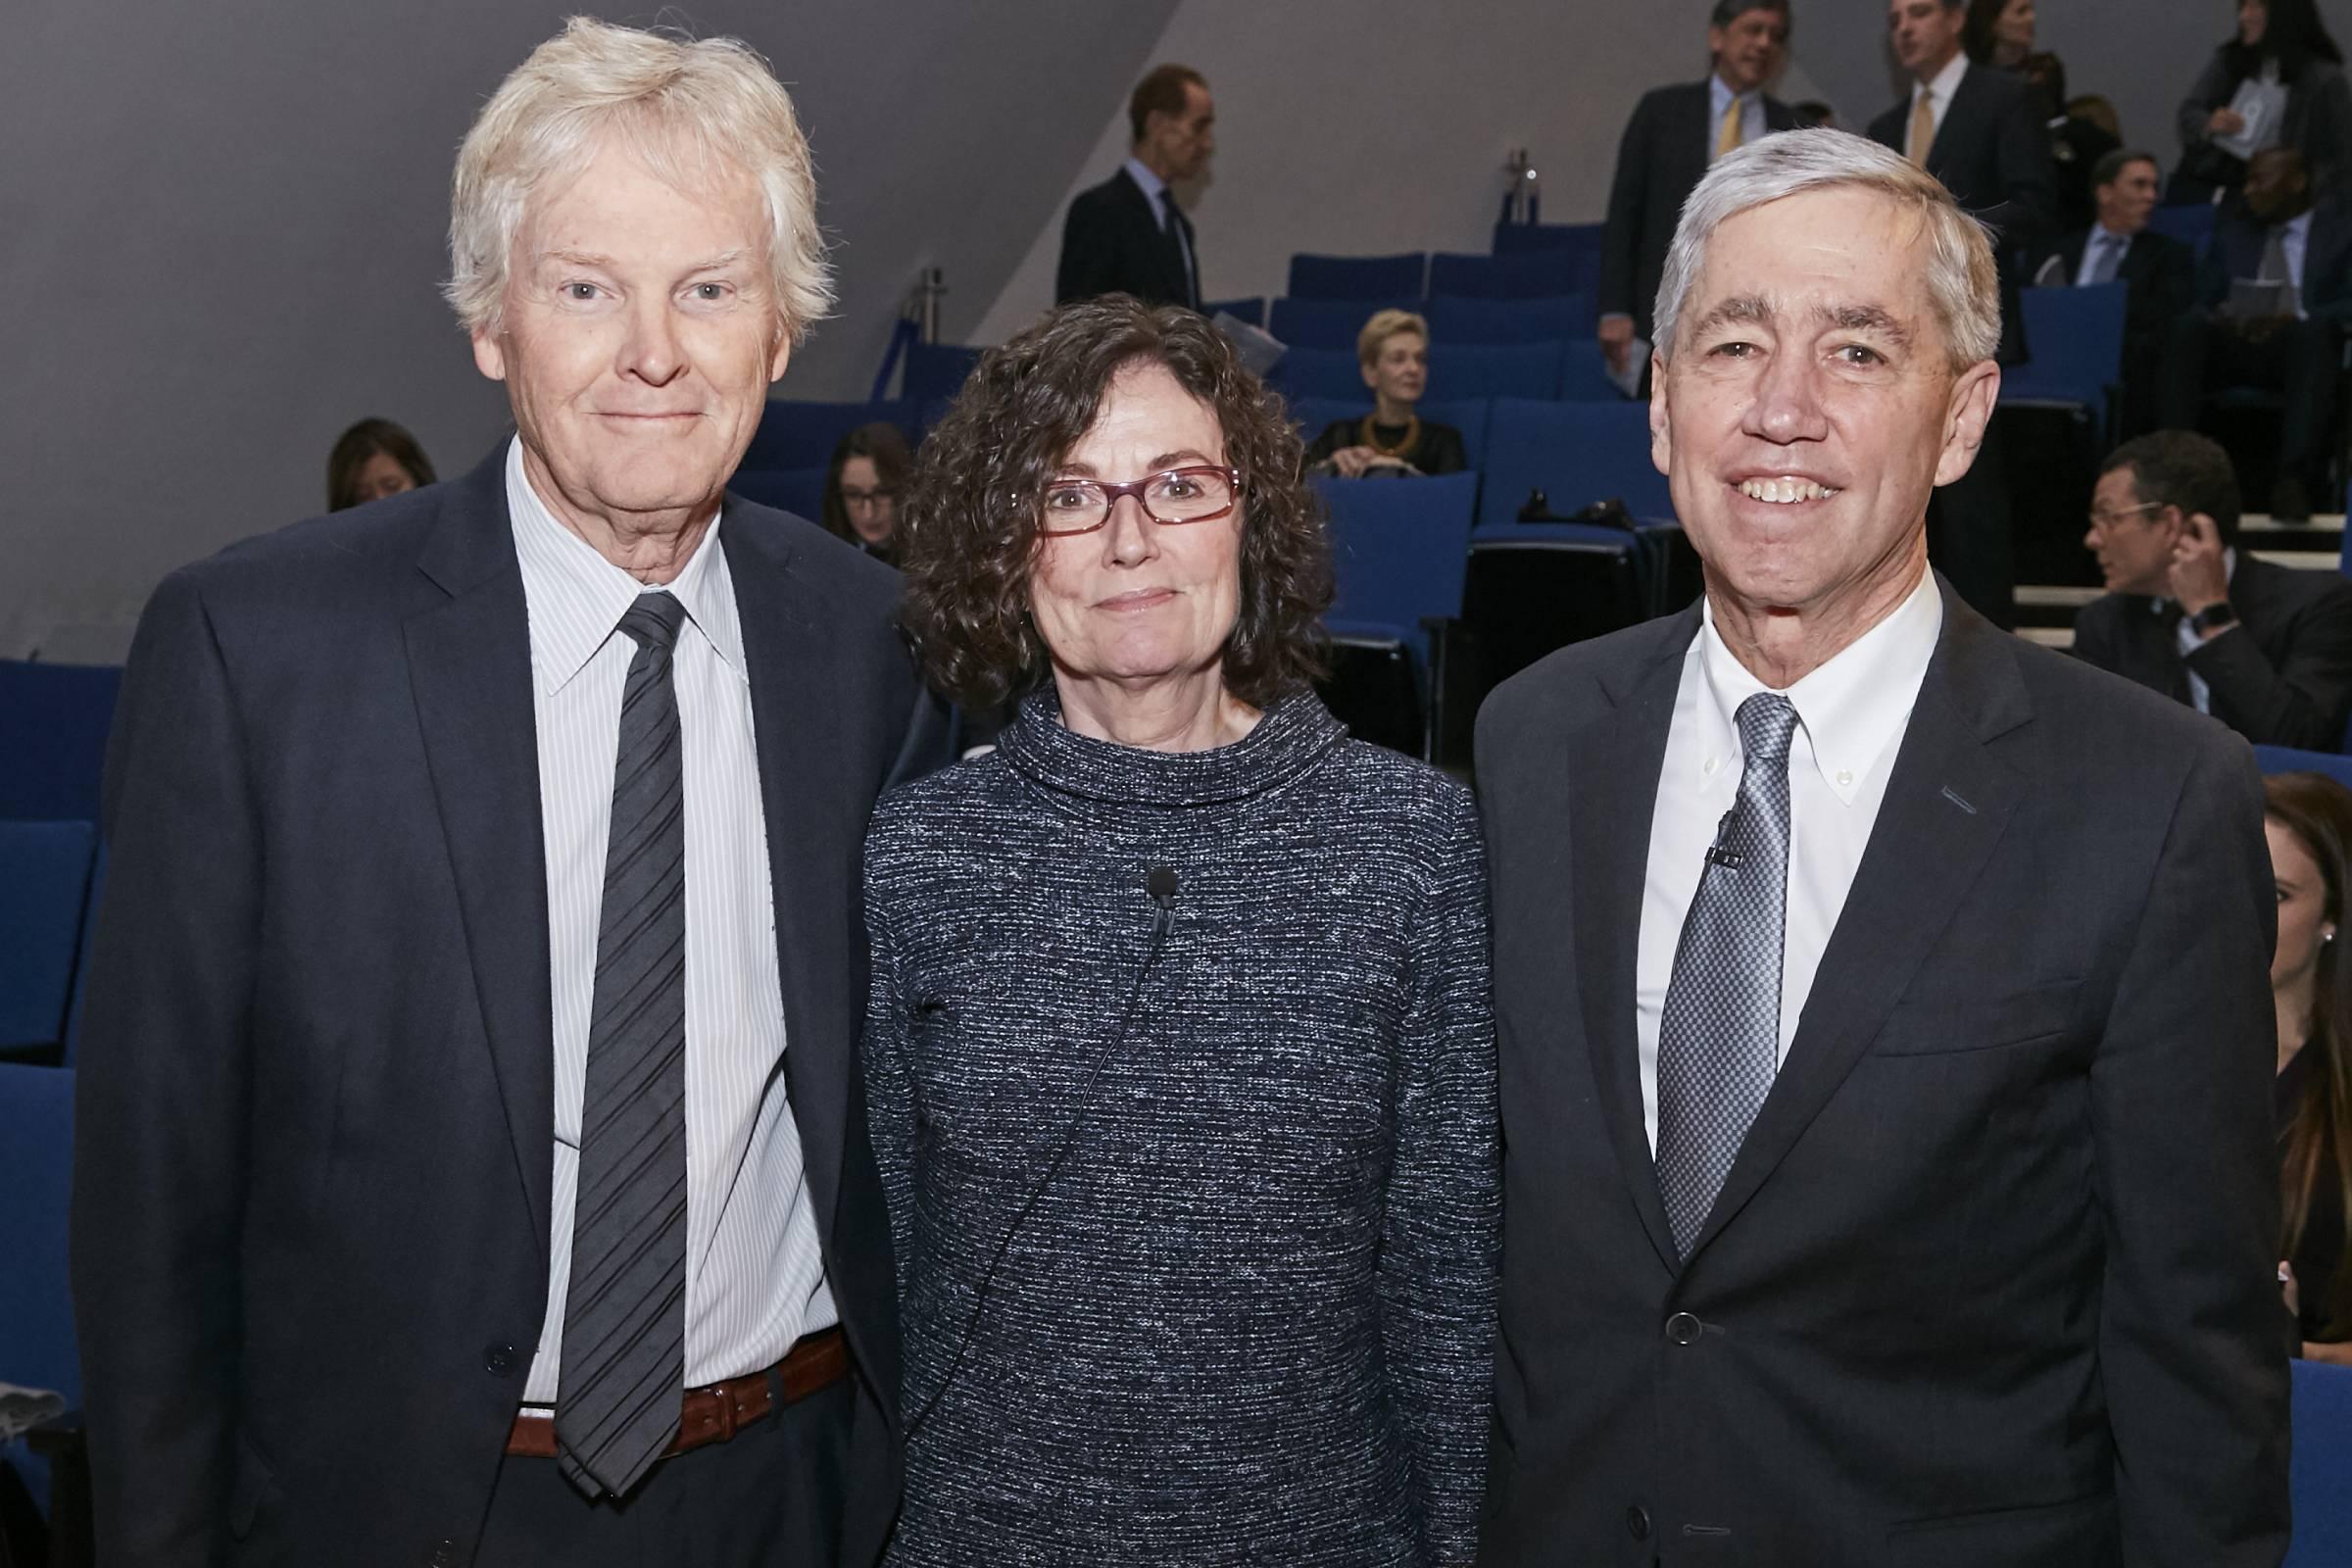 Michael Young, Titia de Lange, and Rick Lifton